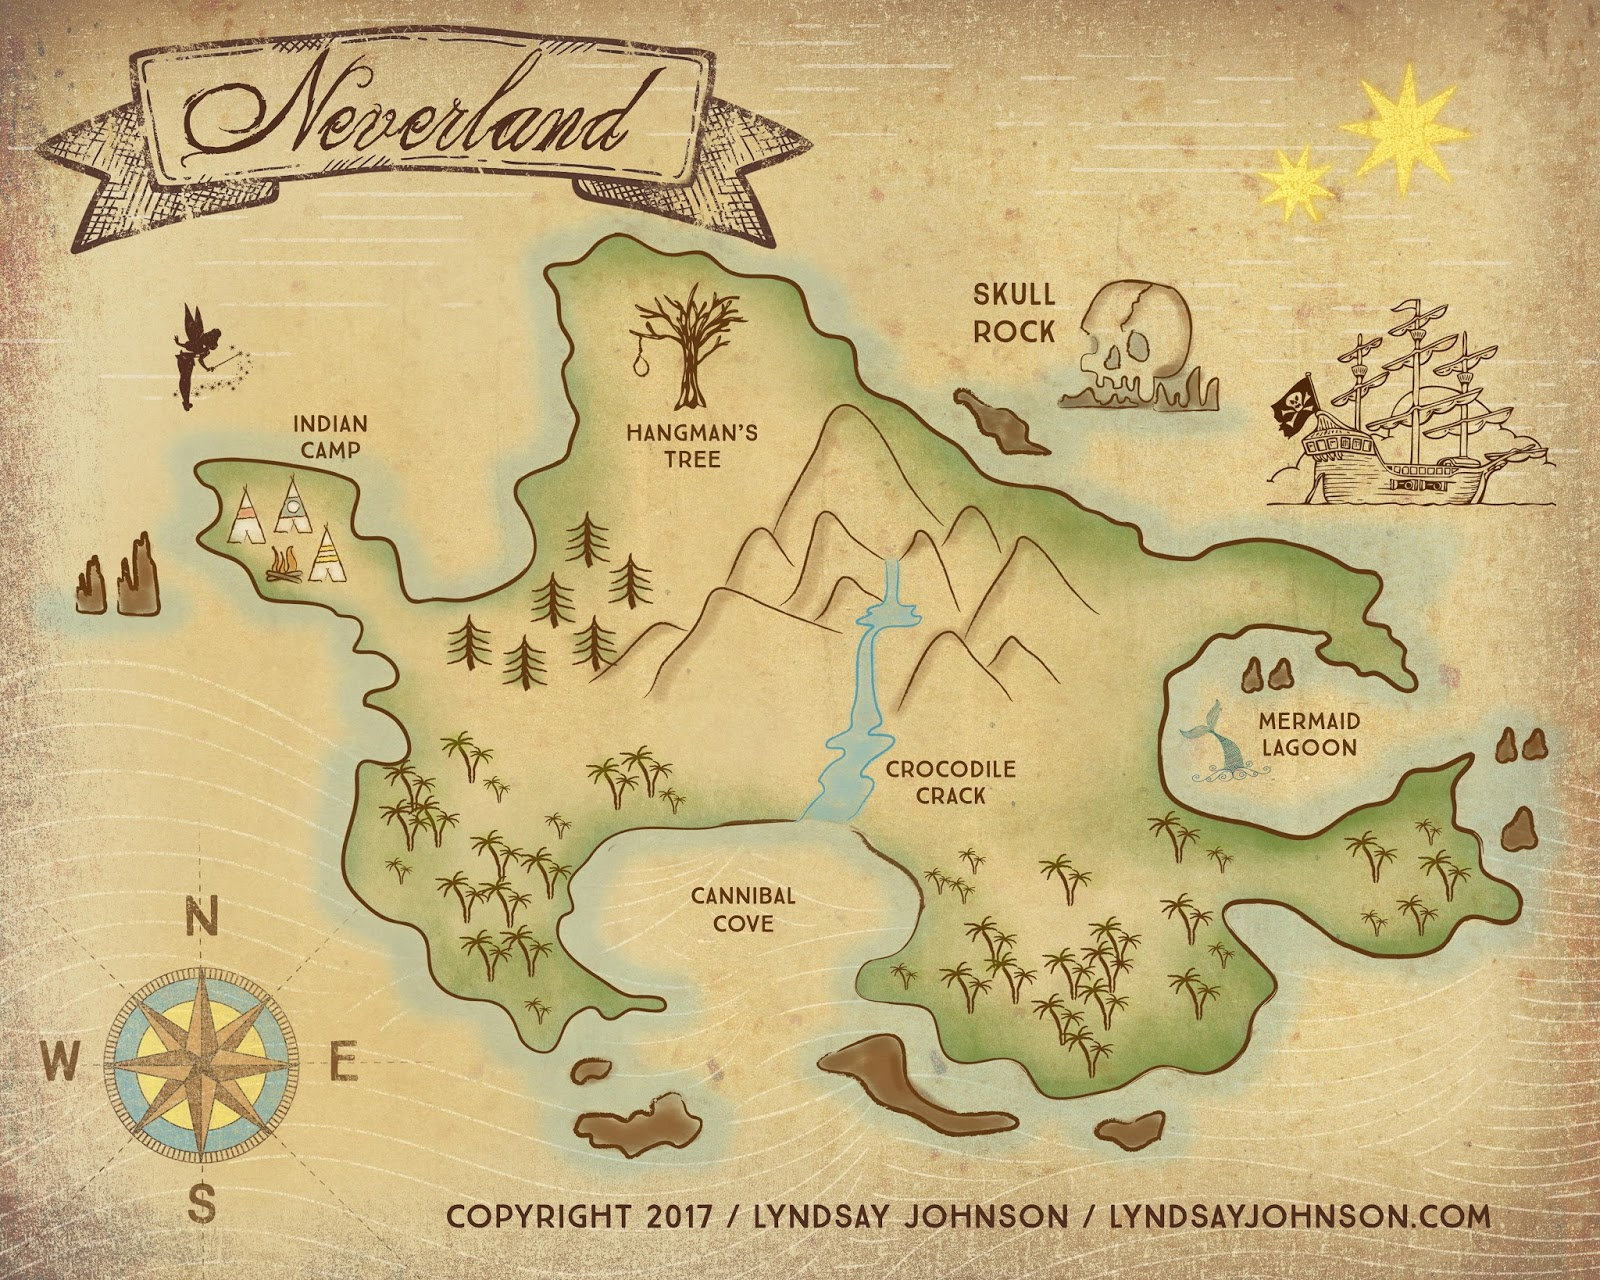 lyndsay johnson neverland map downloadable print